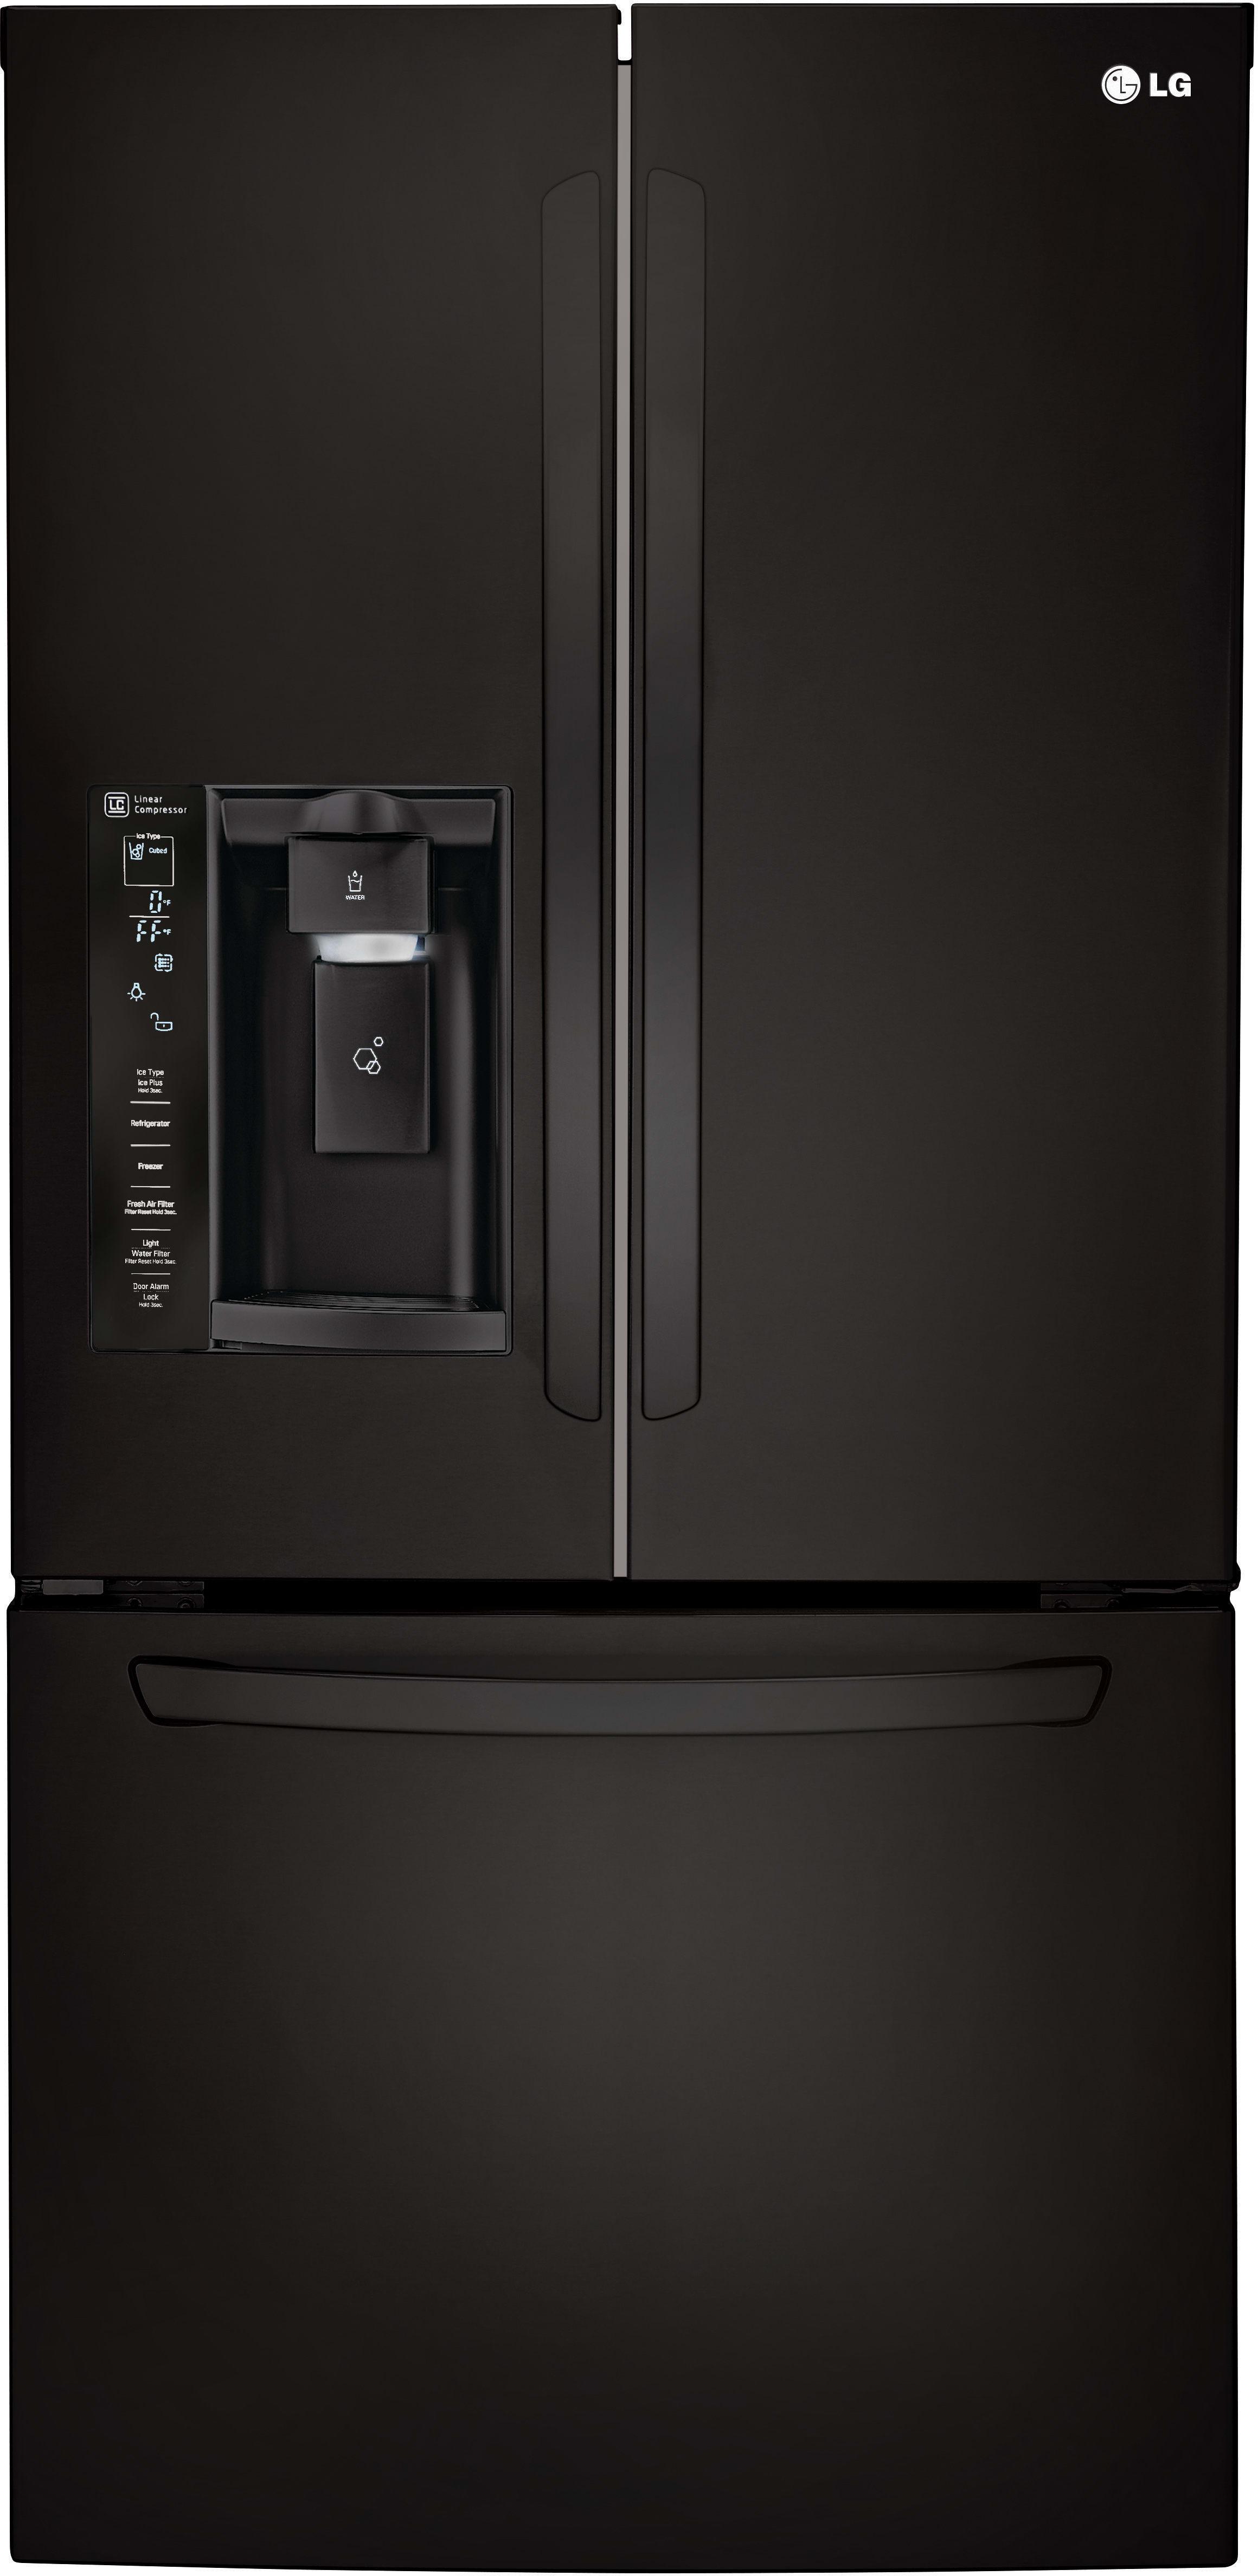 LG LFXS B 33 Inch French Door Refrigerator with Slim SpacePlus